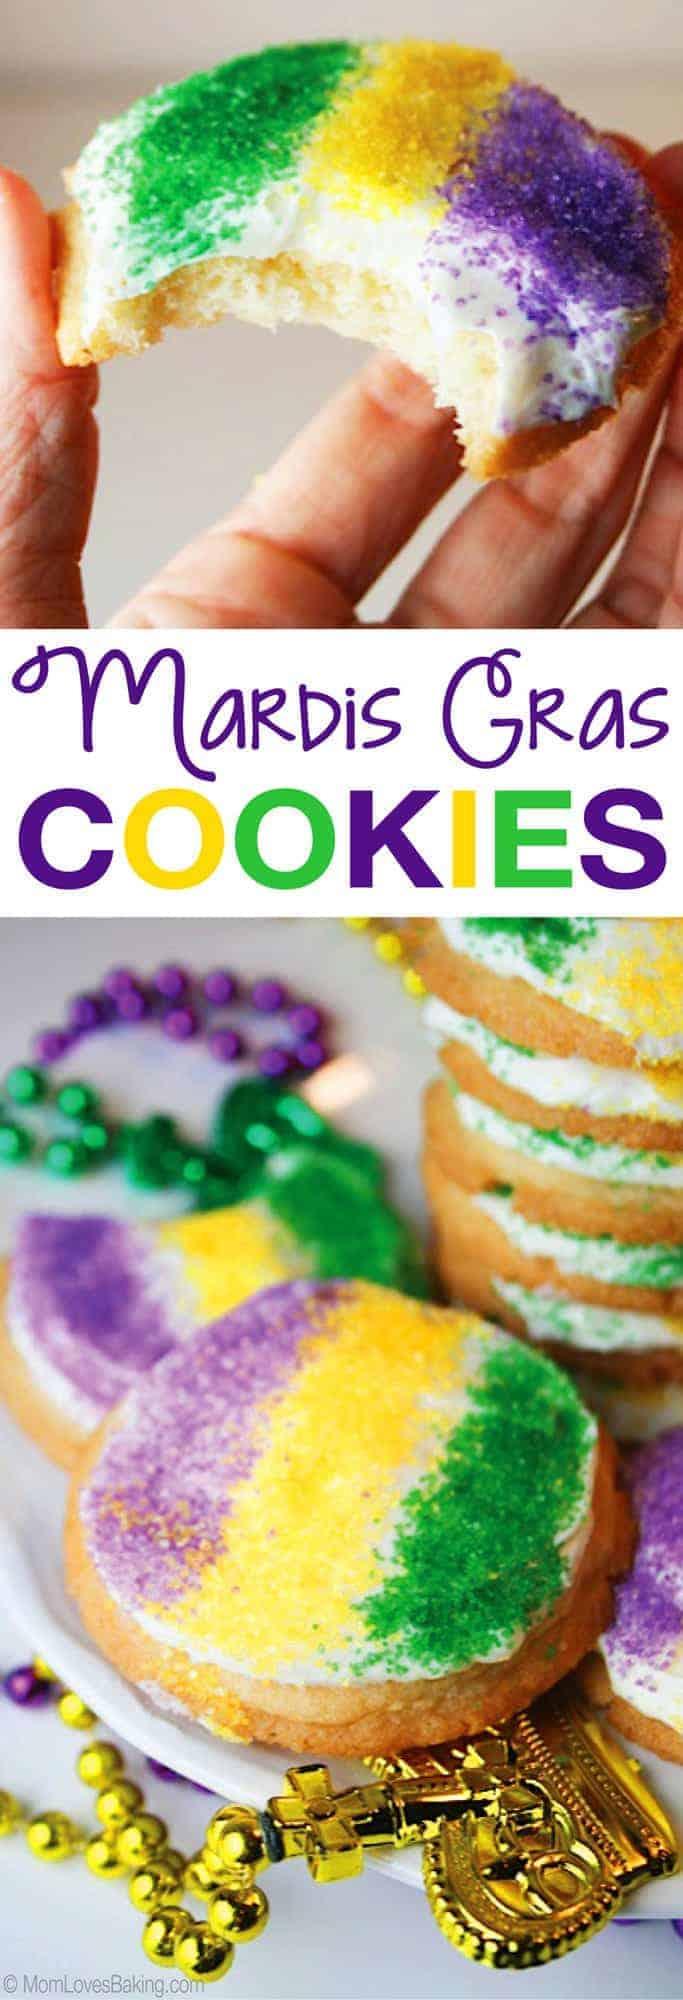 Easy Mardis Gras Cookies